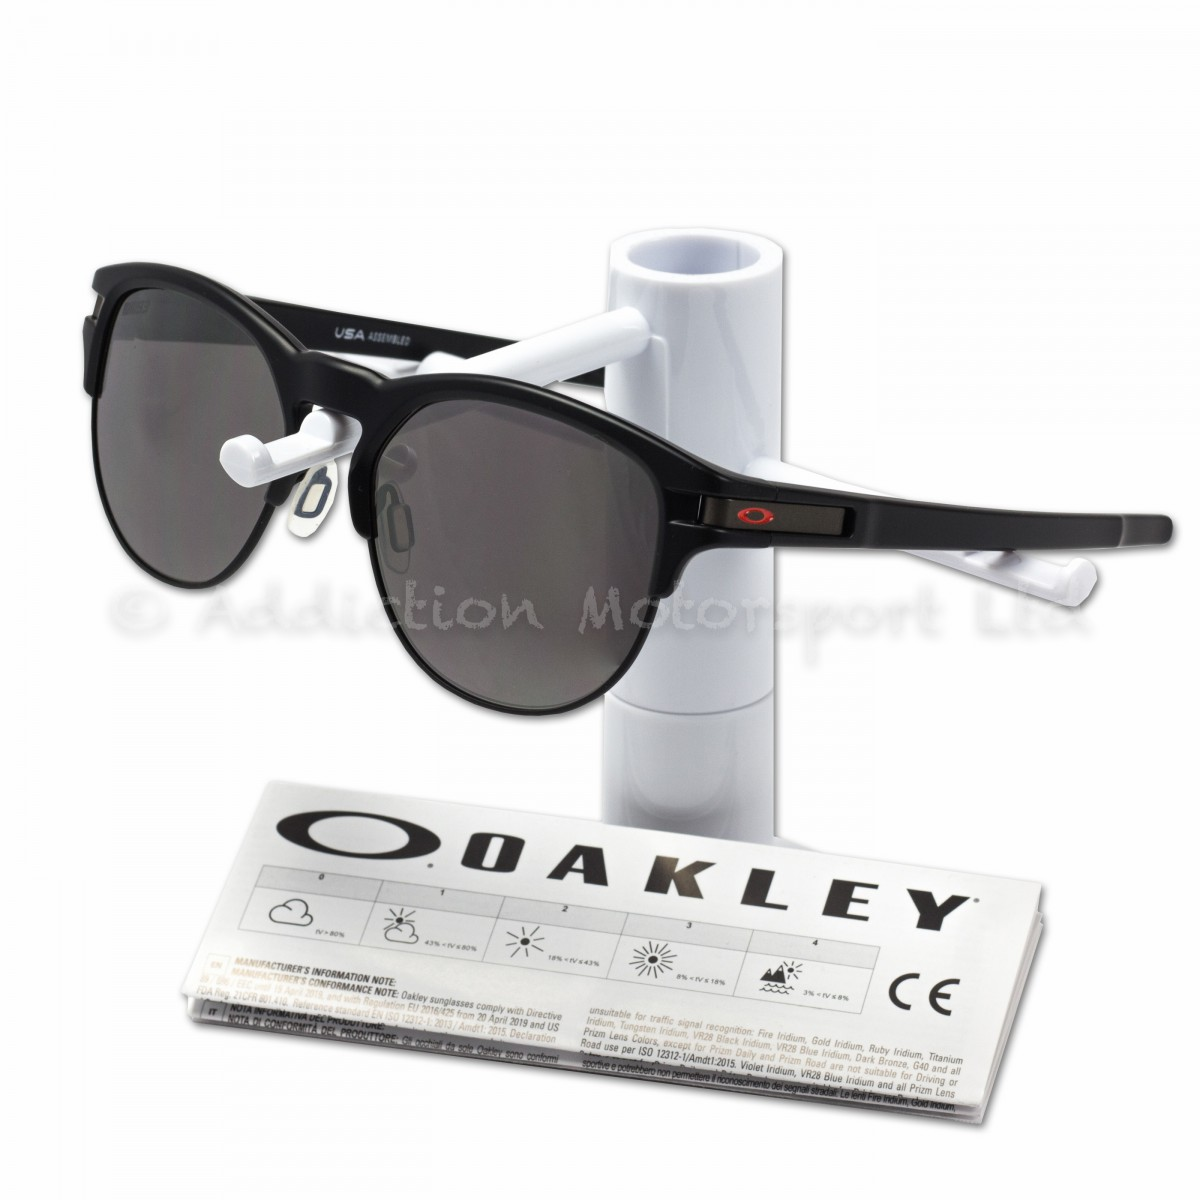 73984b34bafcb OAKLEY Latch Key Marc Marquez MM93 Signature Sunglasses Matt Black Prizm  Black Size M